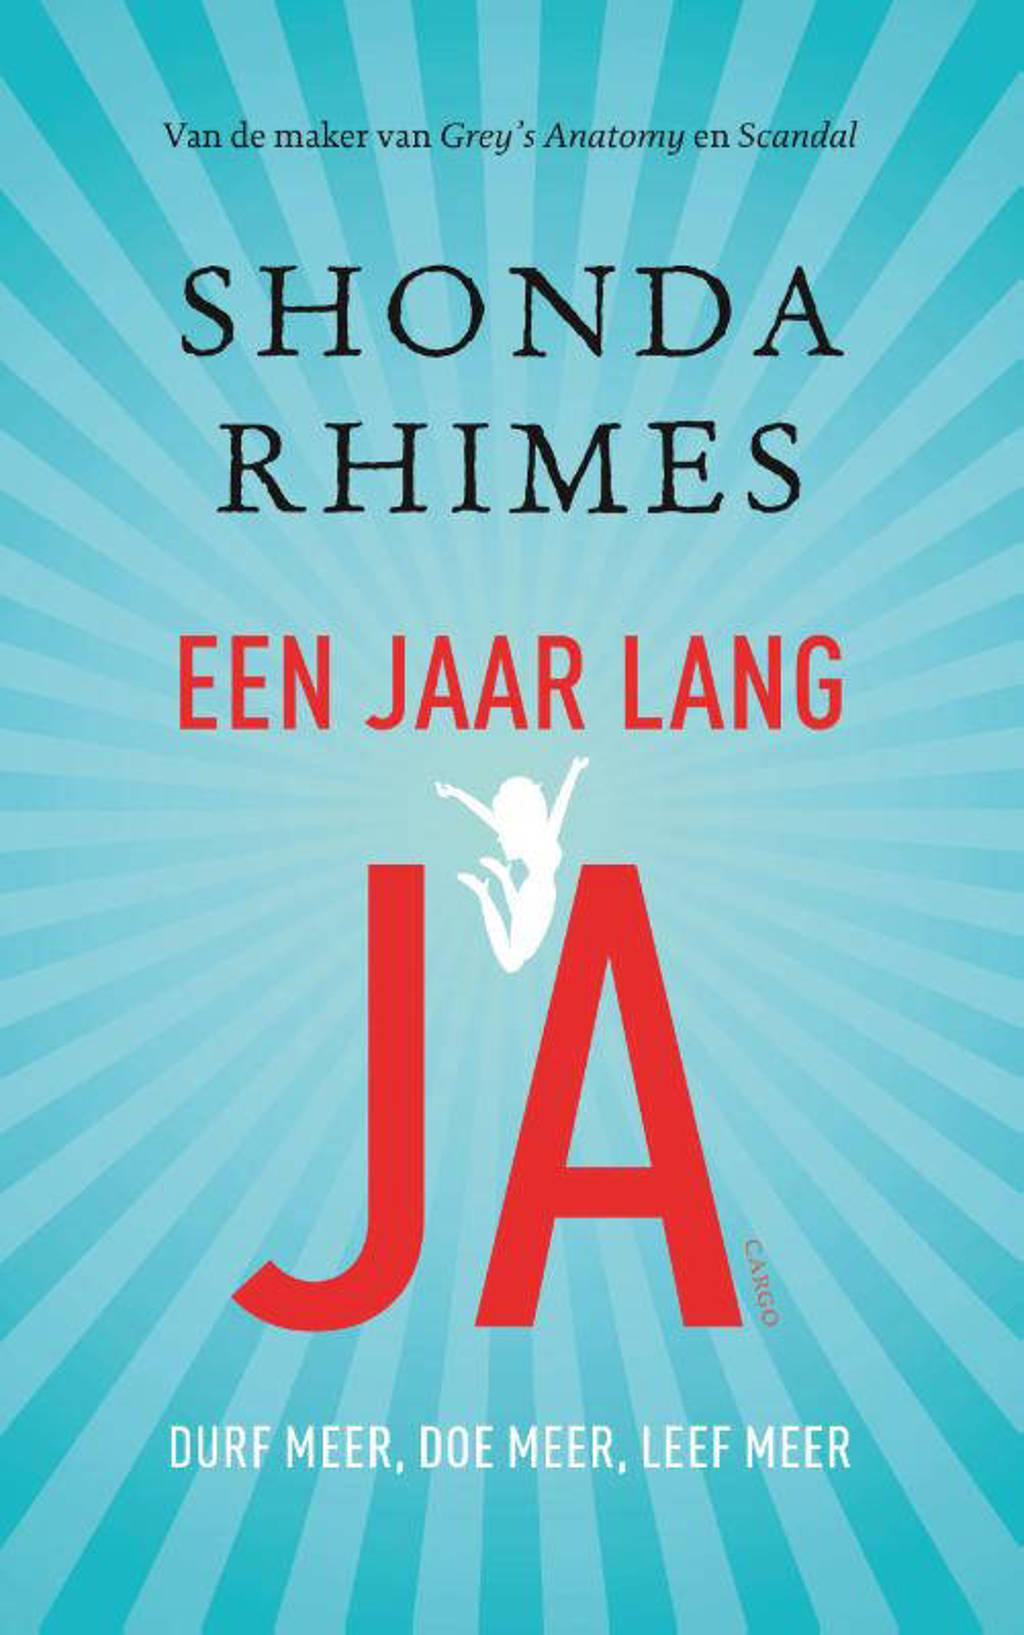 Een jaar lang JA - Shonda Rhimes